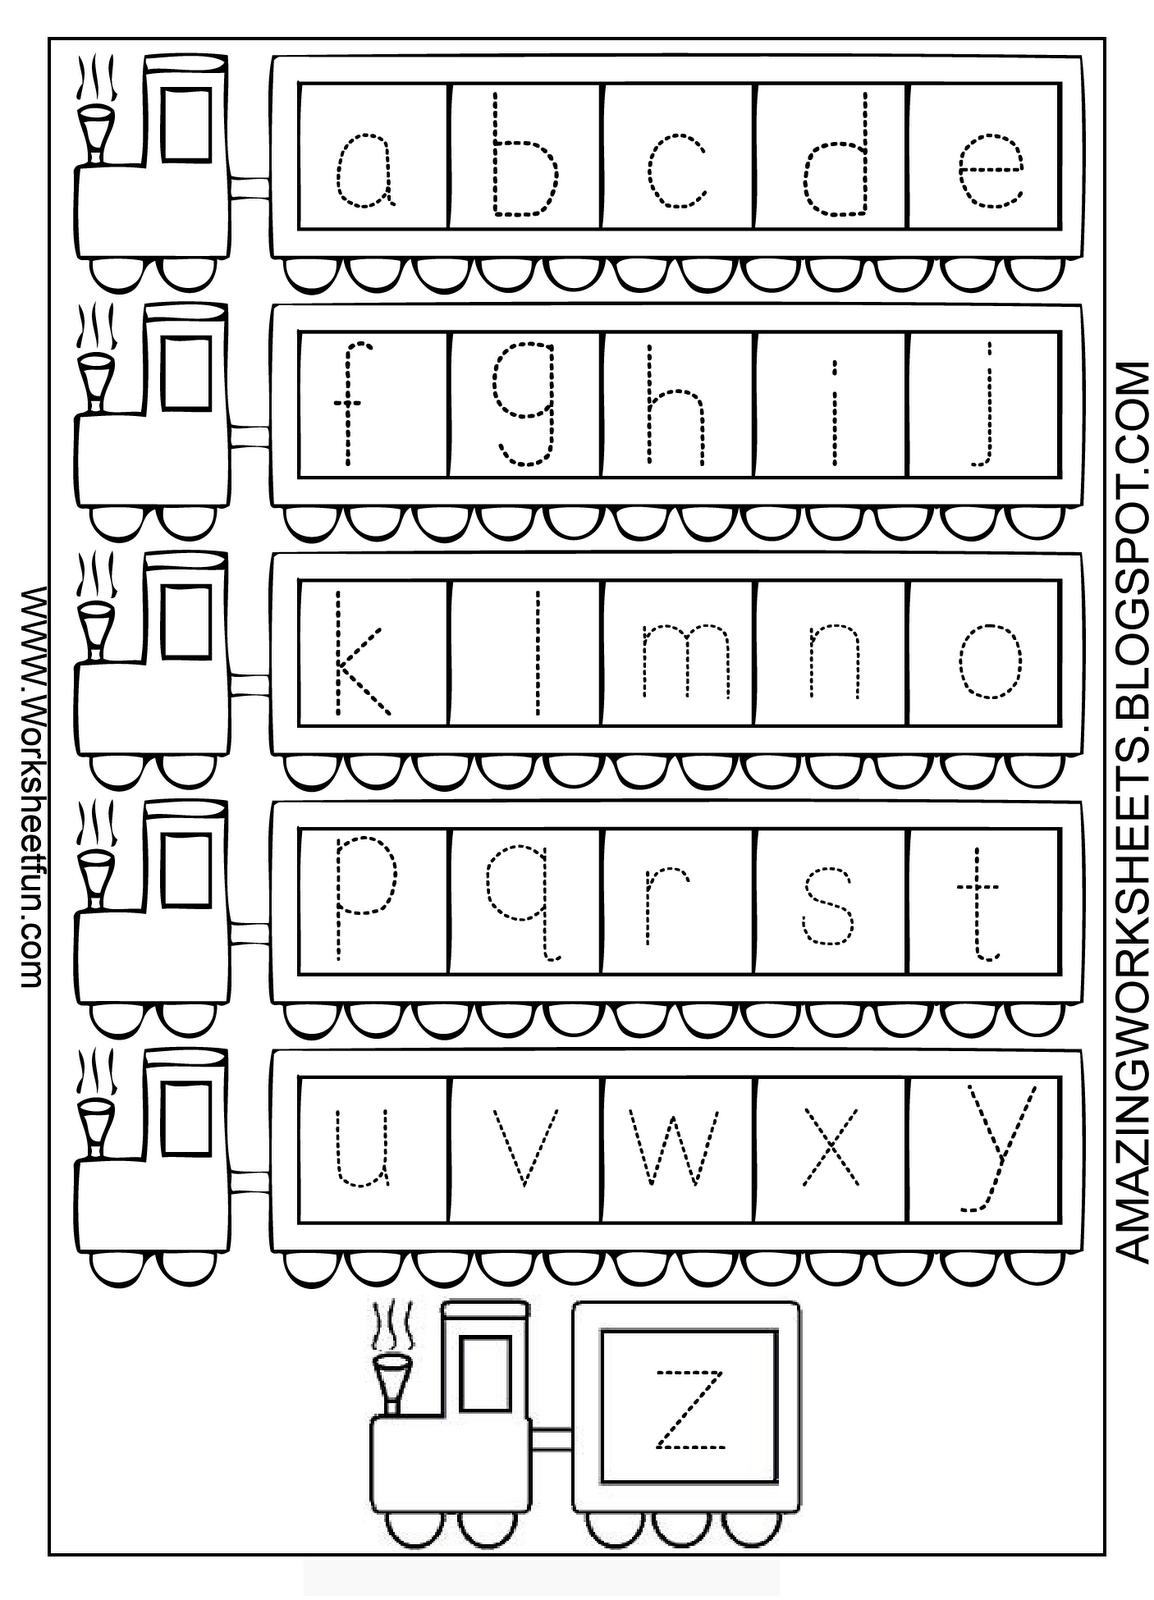 Printable Alphabet Worksheets A Z : Lowercase alphabet letter tracing worksheets